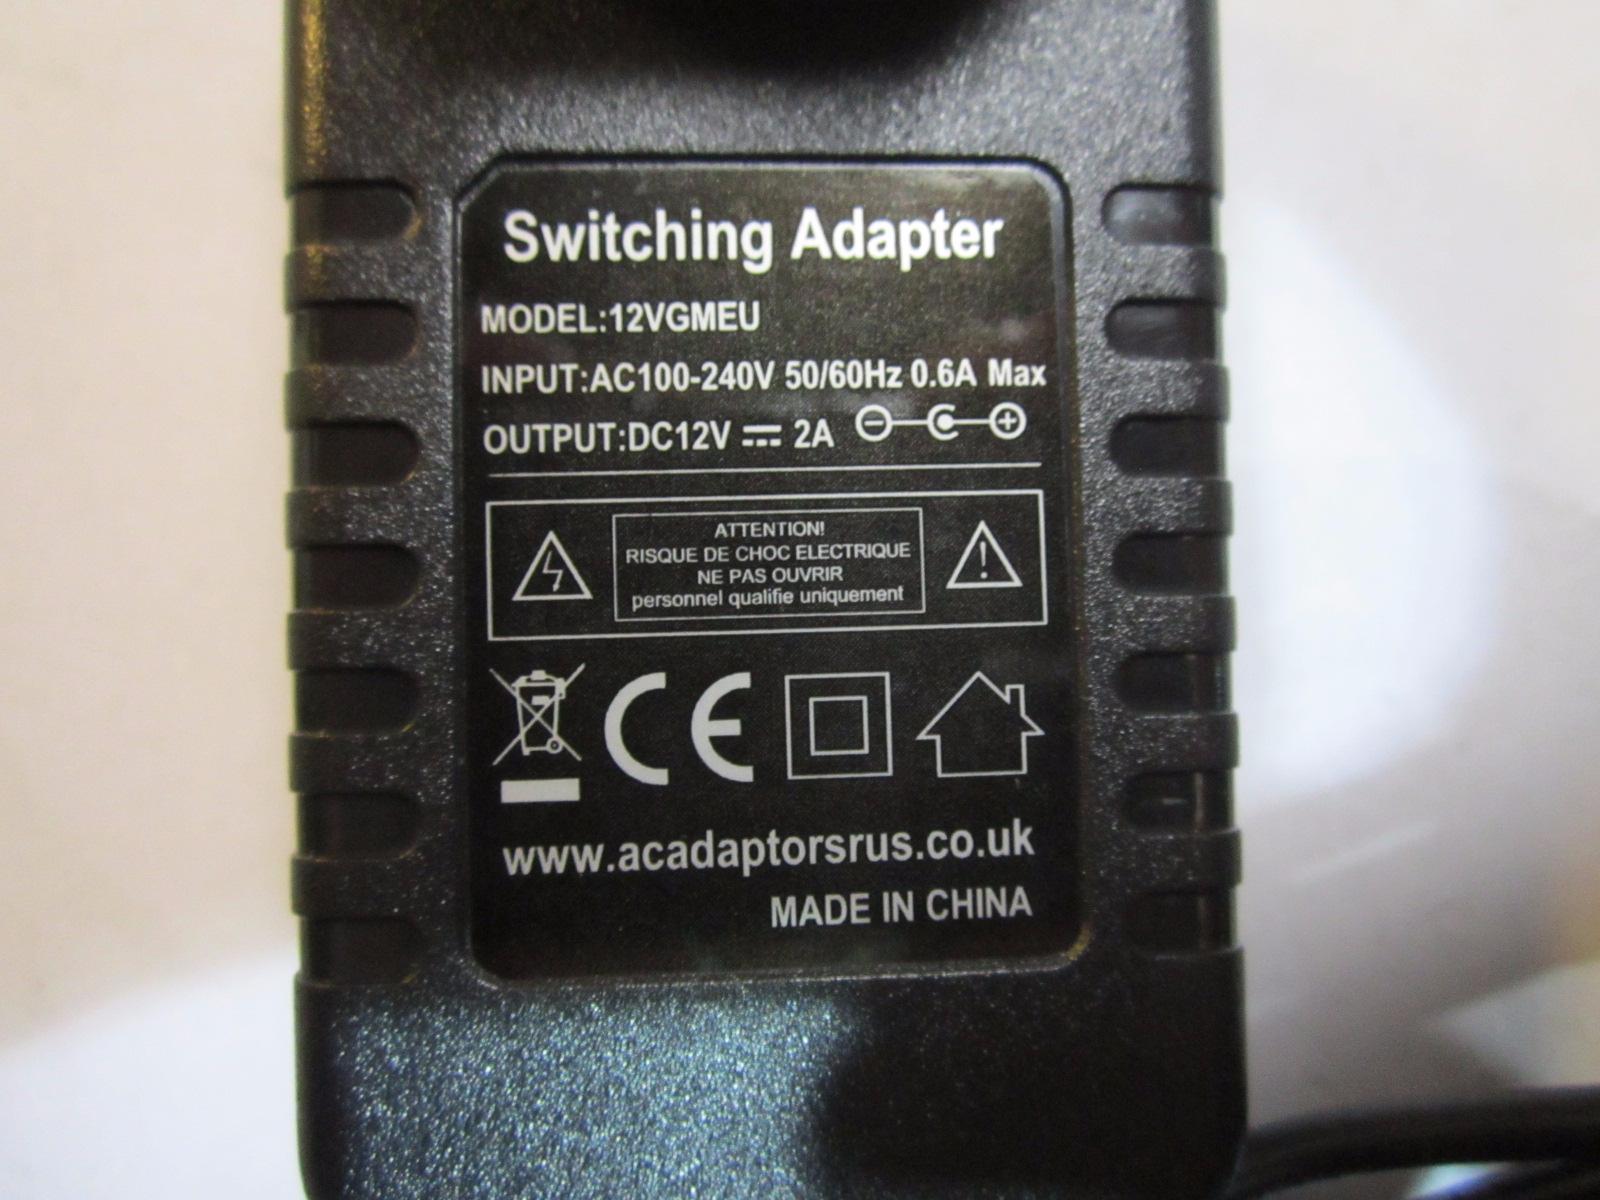 EU-2-PIN-Advent-Vega-Android-Tablet-12V-Alimentazione-AC-Adattatore-Caricabatteria-Alimentatore